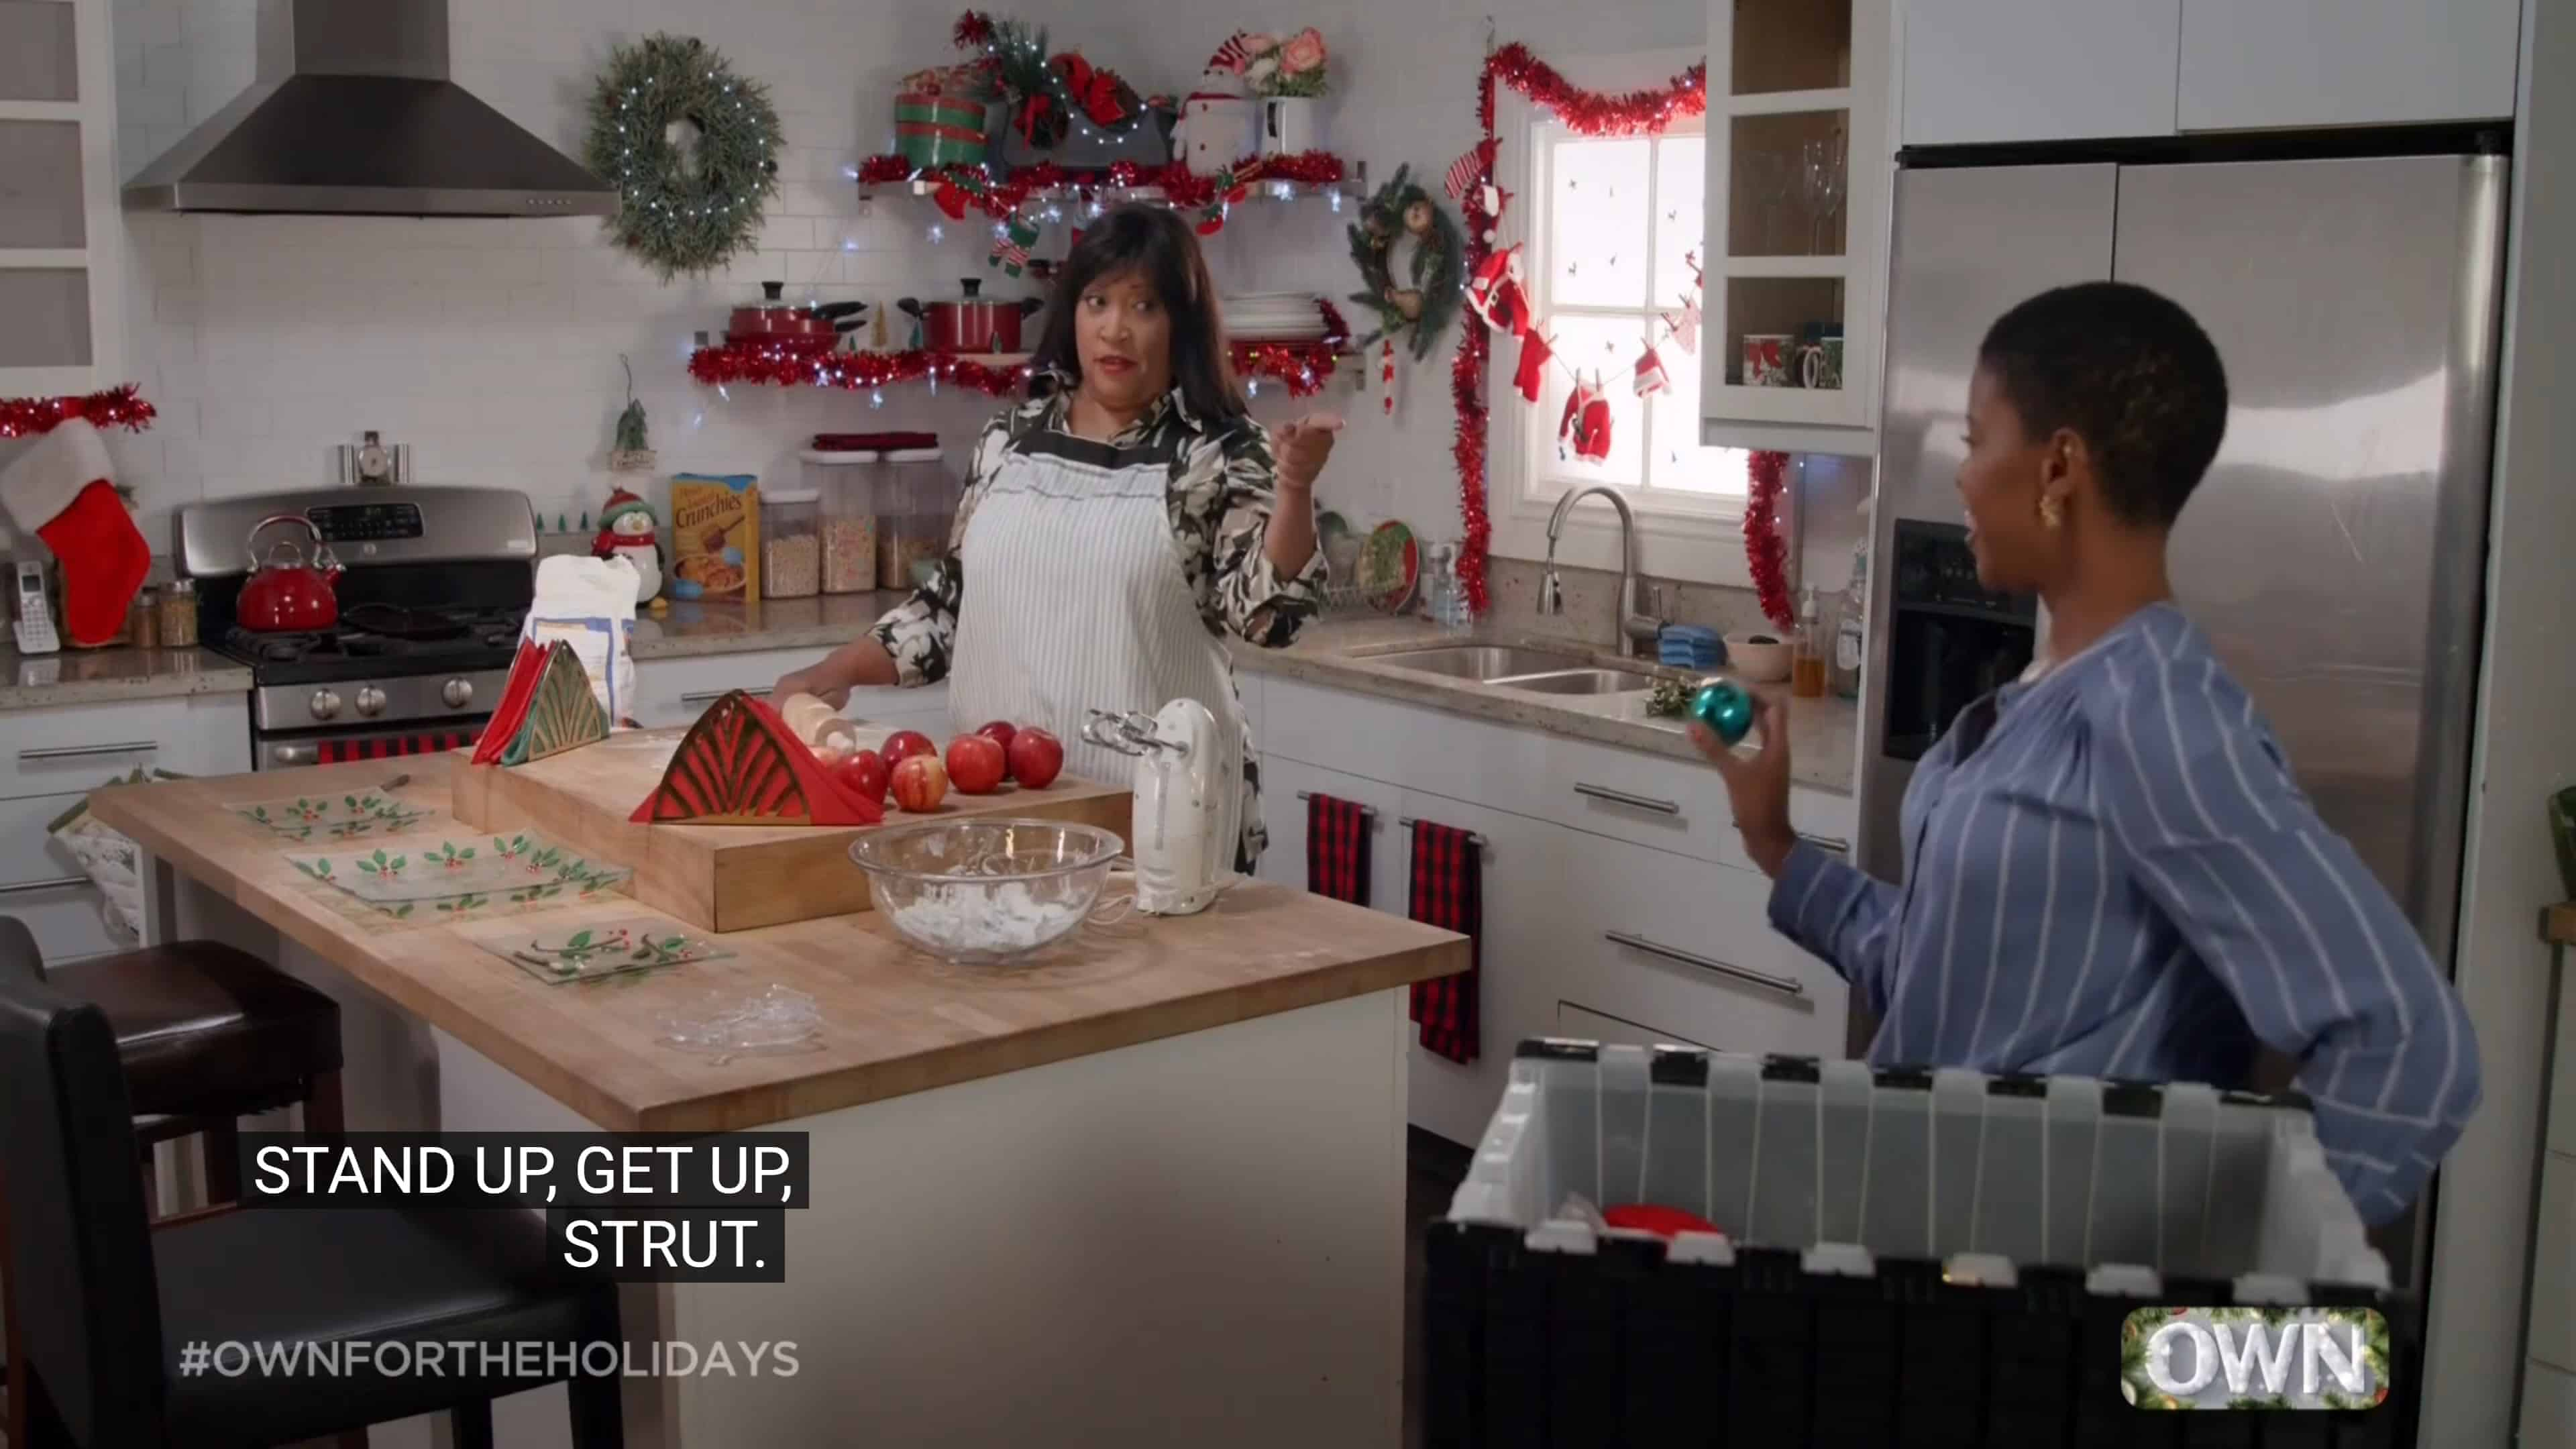 Debbie (Jackée Harry) and Lena (Morgan Dixon) talking in the kitchen